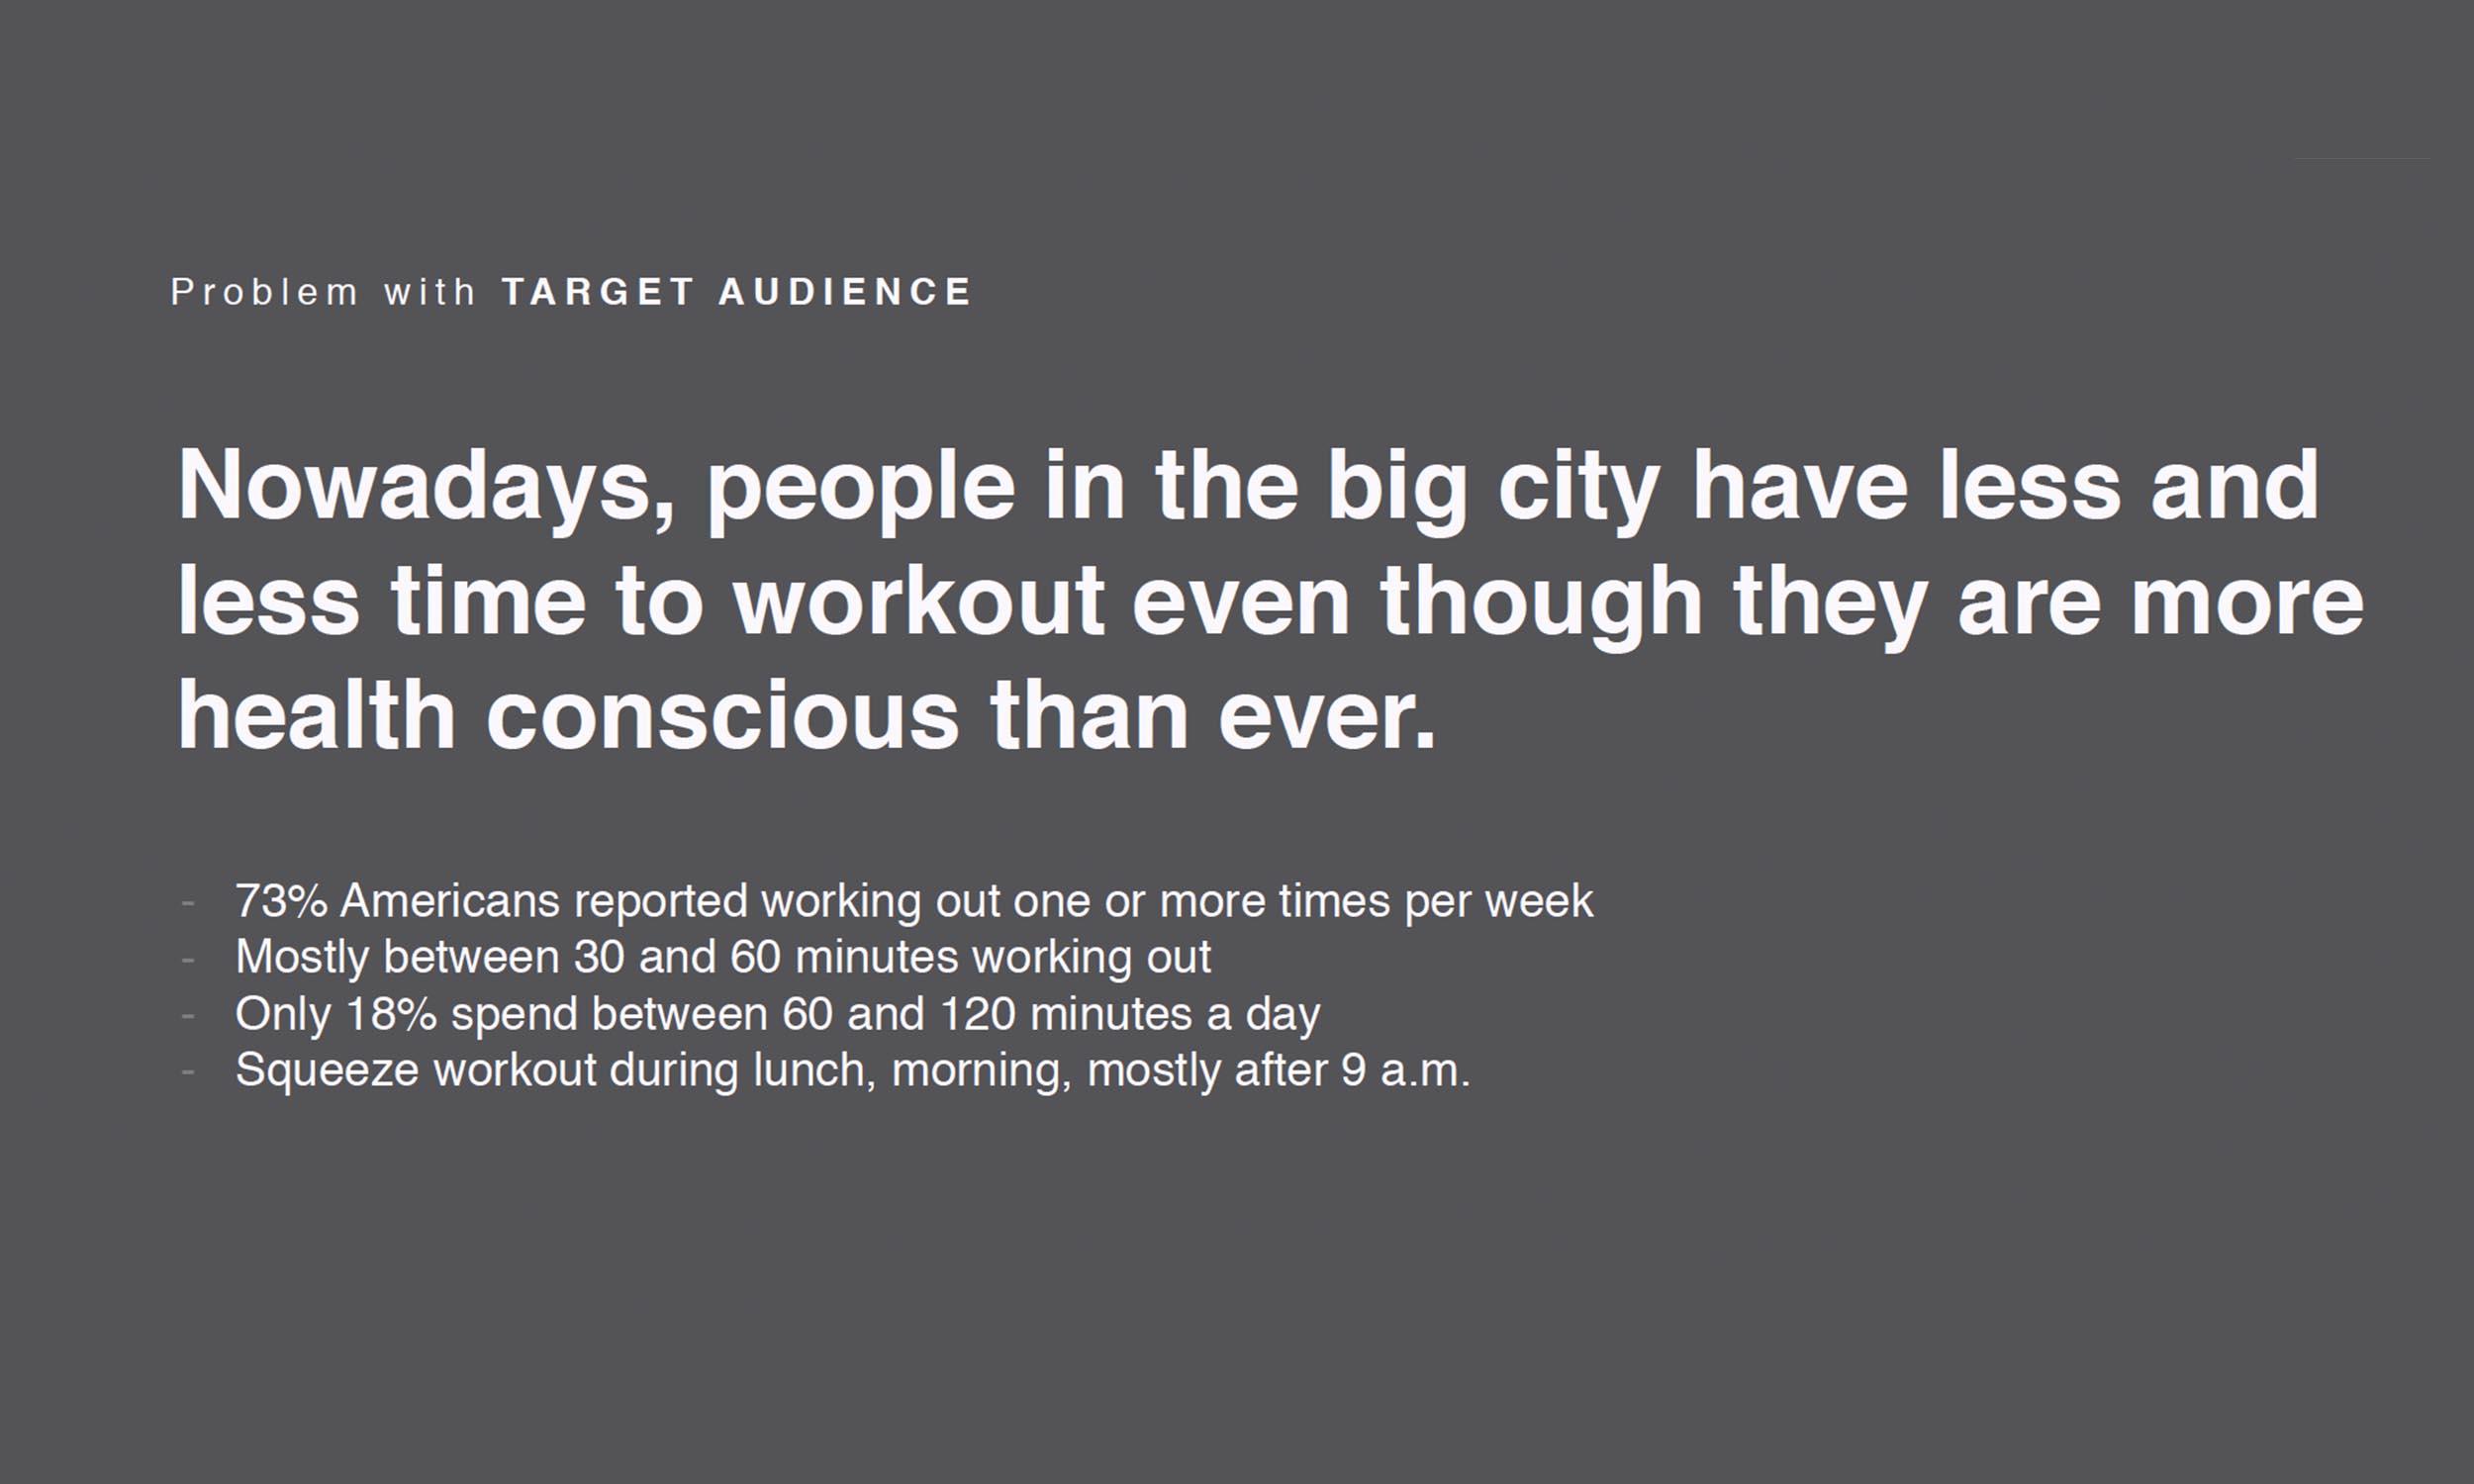 core40-target-audience-problem.jpg